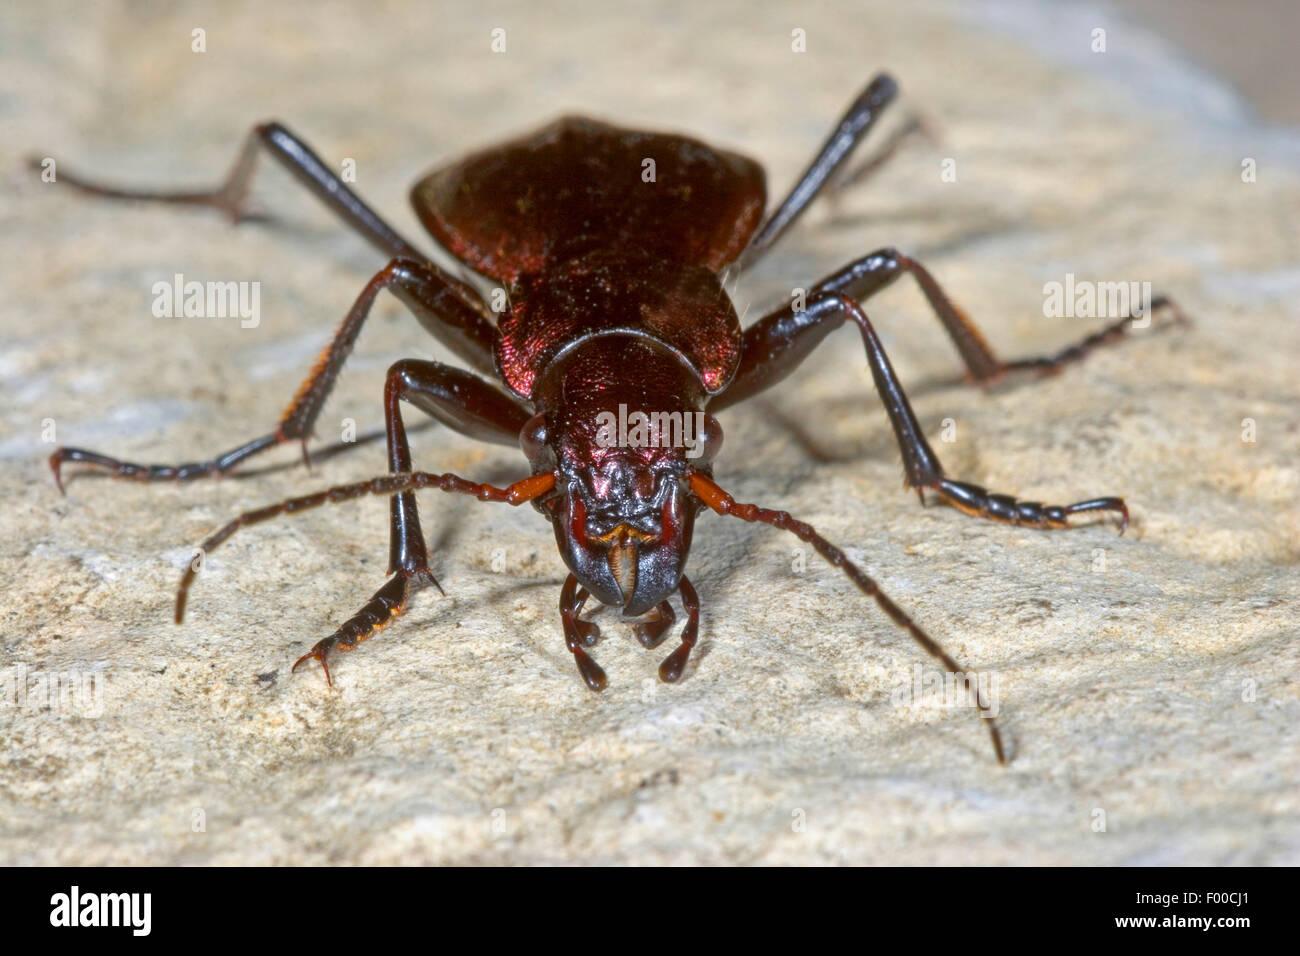 Montane Boden Käfer (Carabus Irregularis, Platycarabus Irregularis), Frontansicht, Deutschland Stockbild